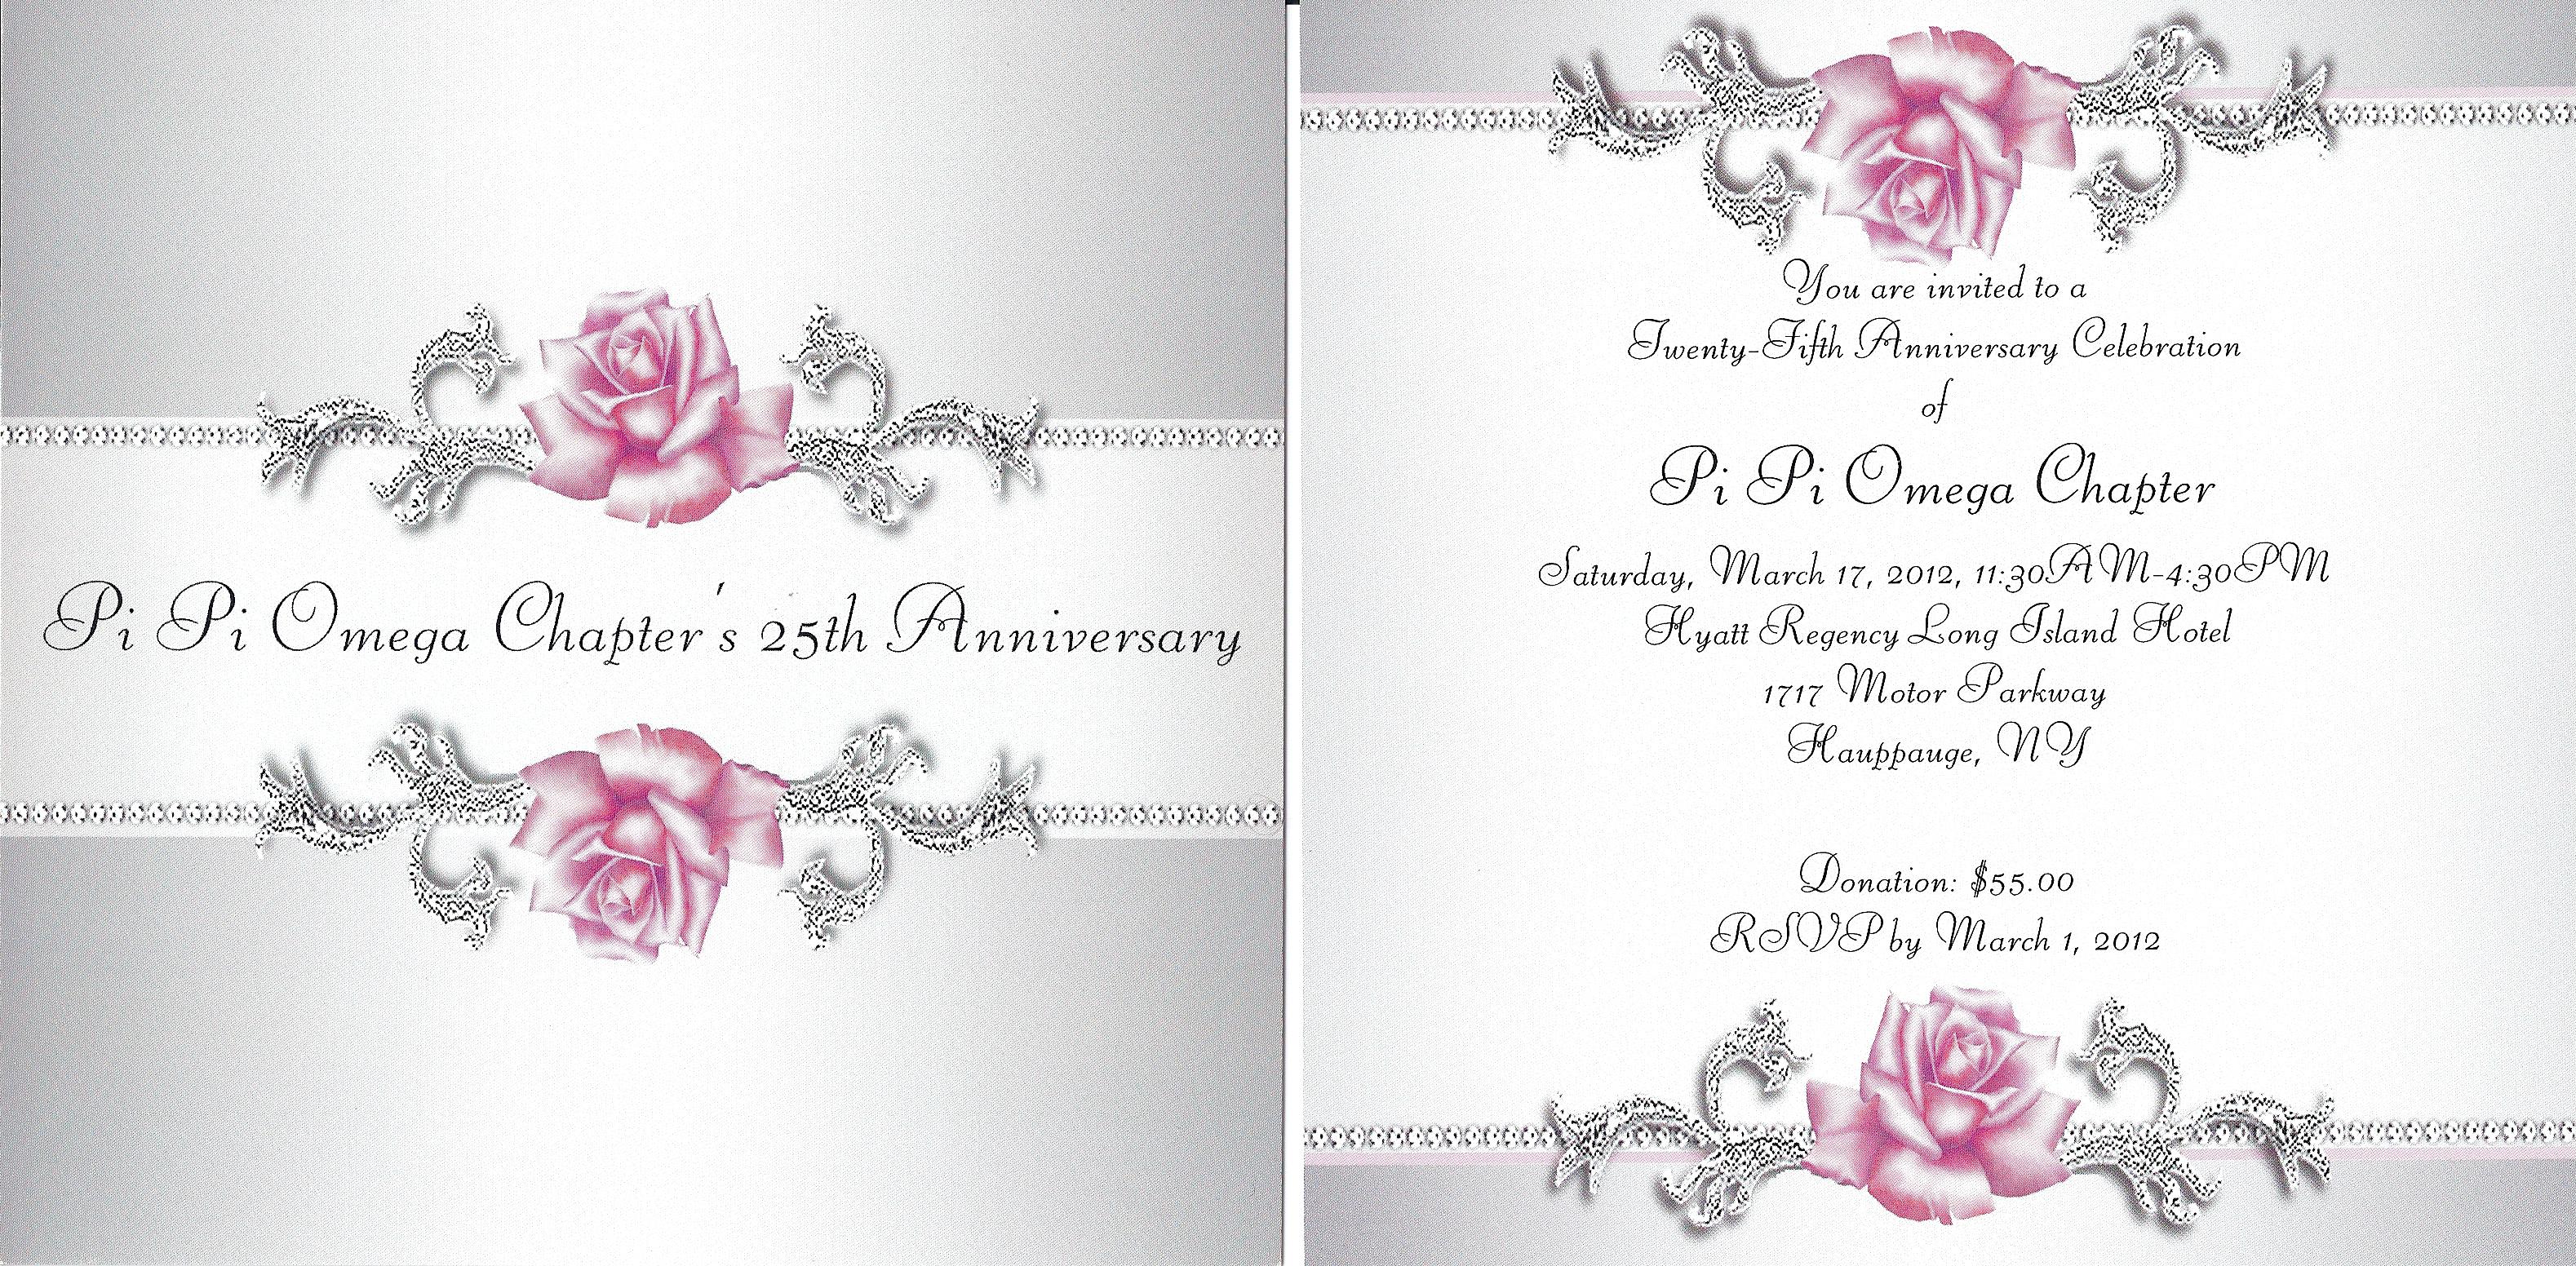 55 anniversary clipart clip art Free Anniversary Invitation Cliparts, Download Free Clip Art, Free ... clip art